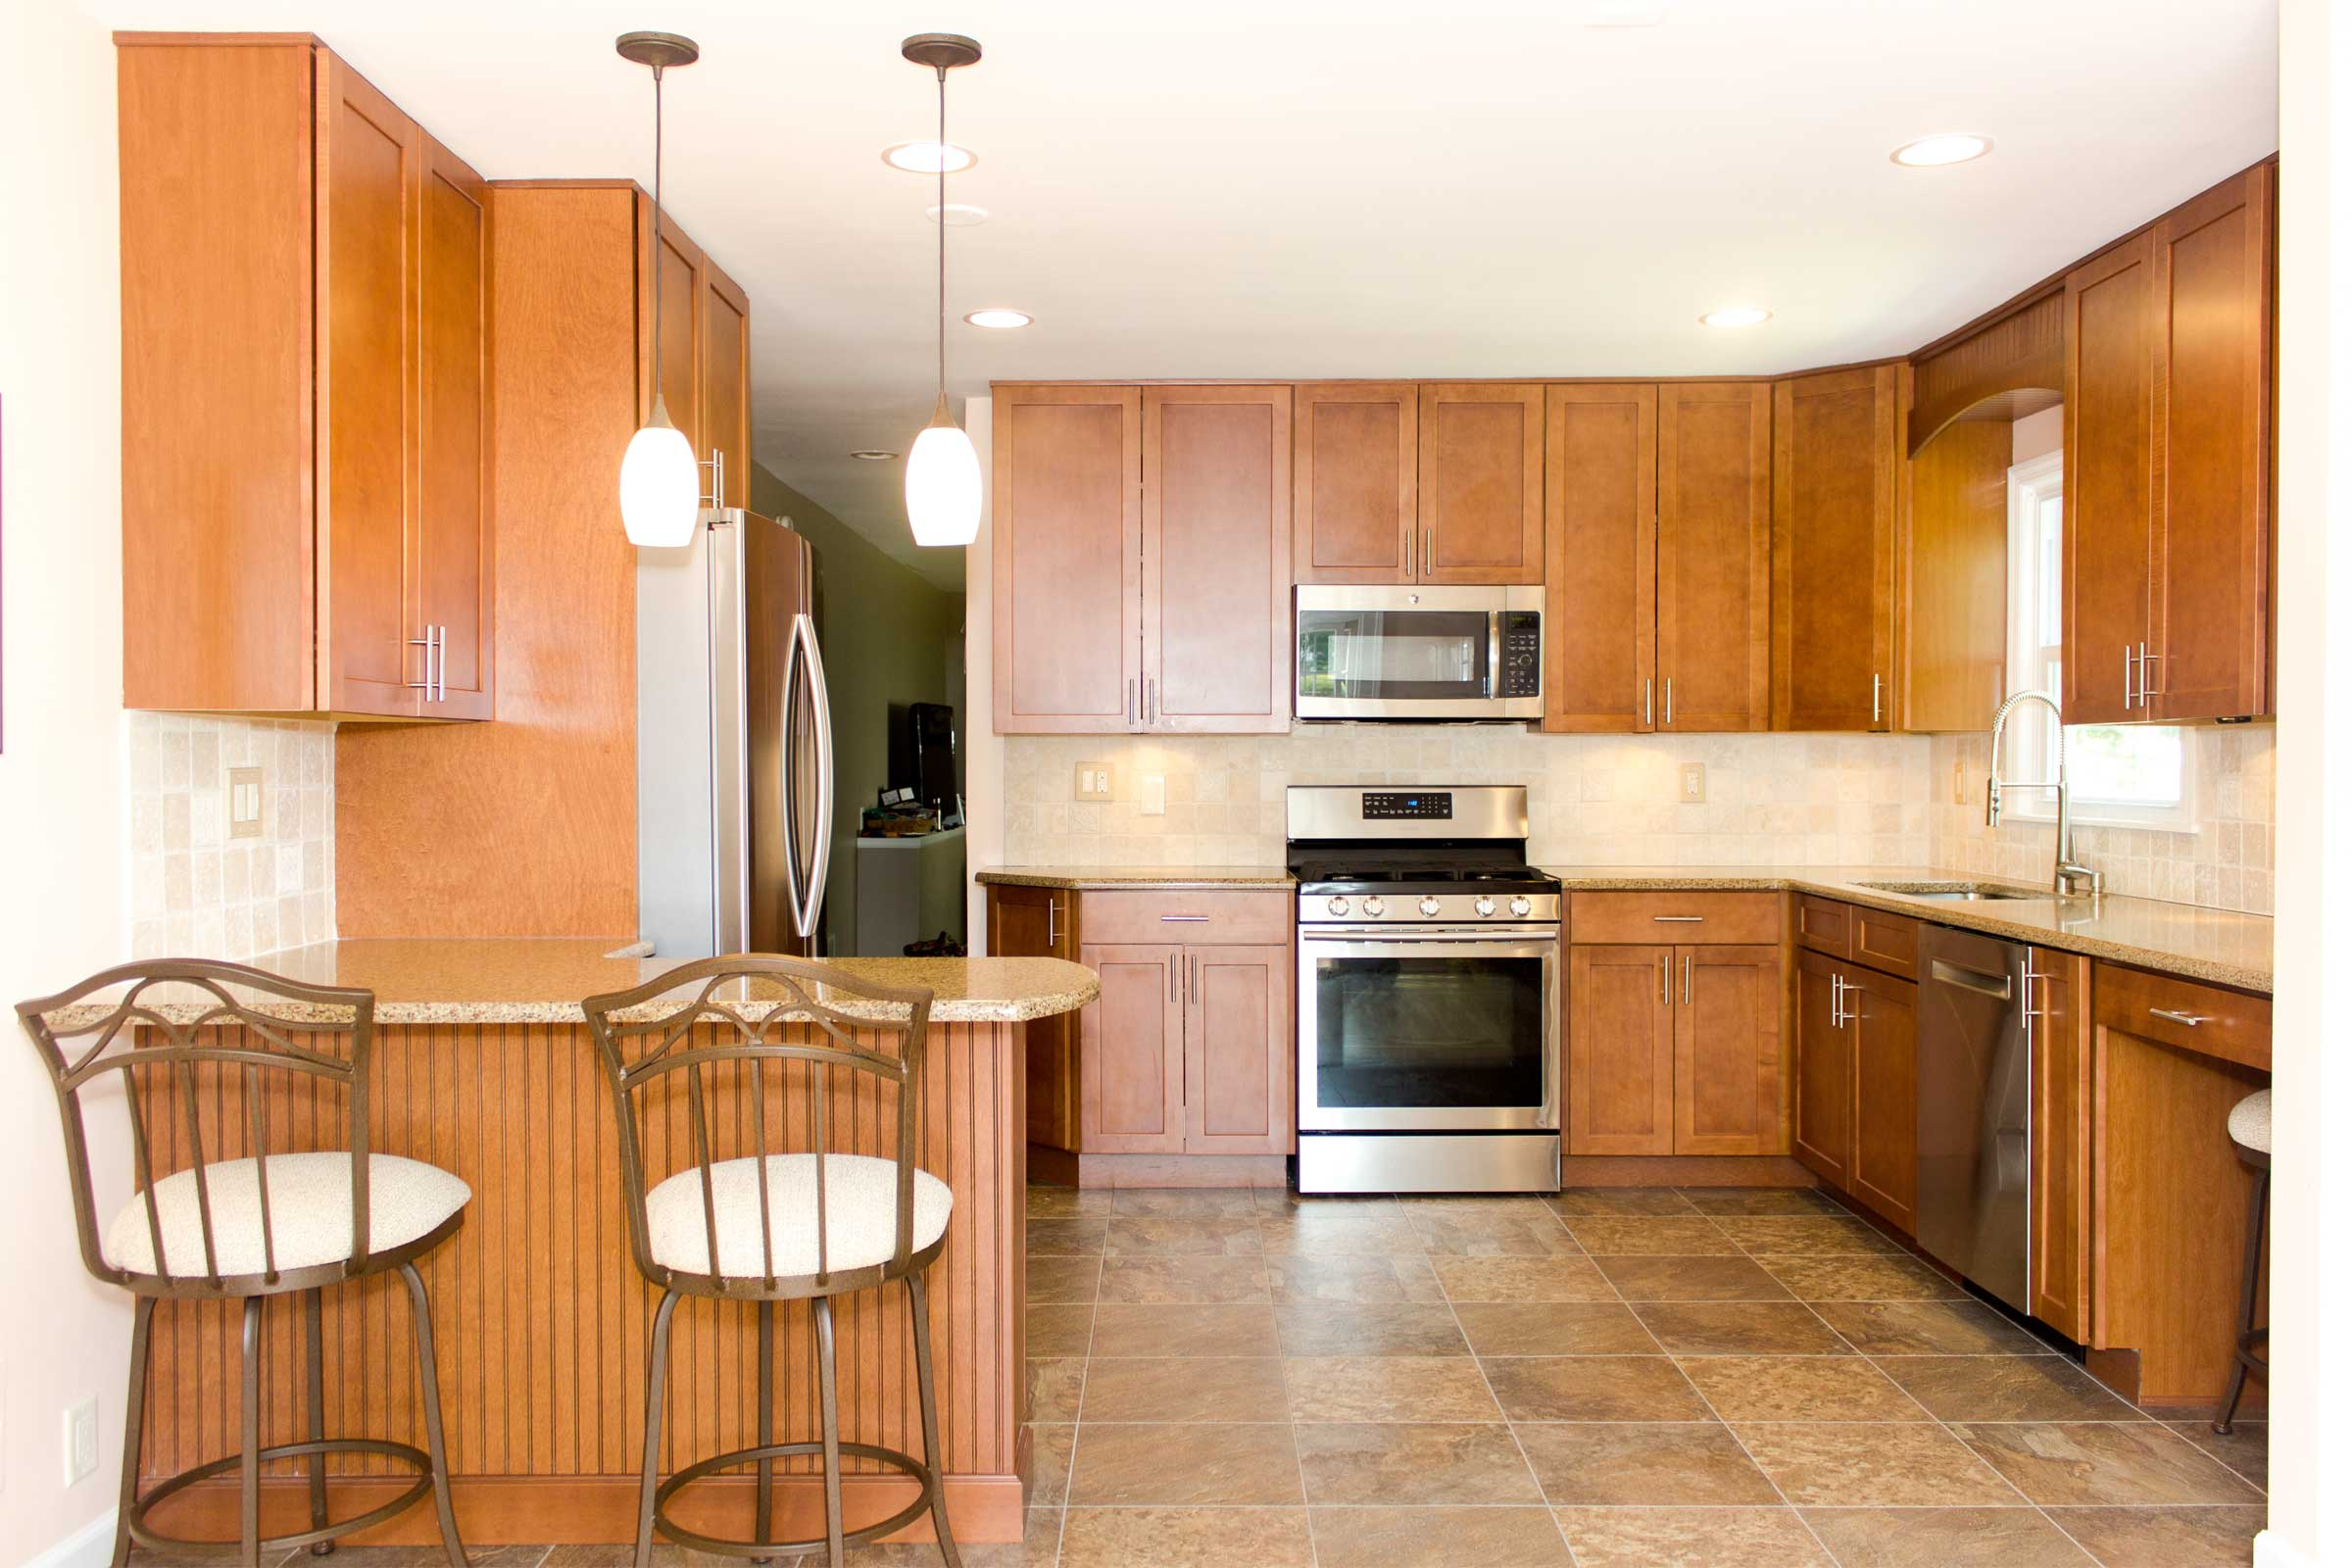 The Basic Kitchen Co._Kitchen Renovation_Highbridge NJ_August 2014